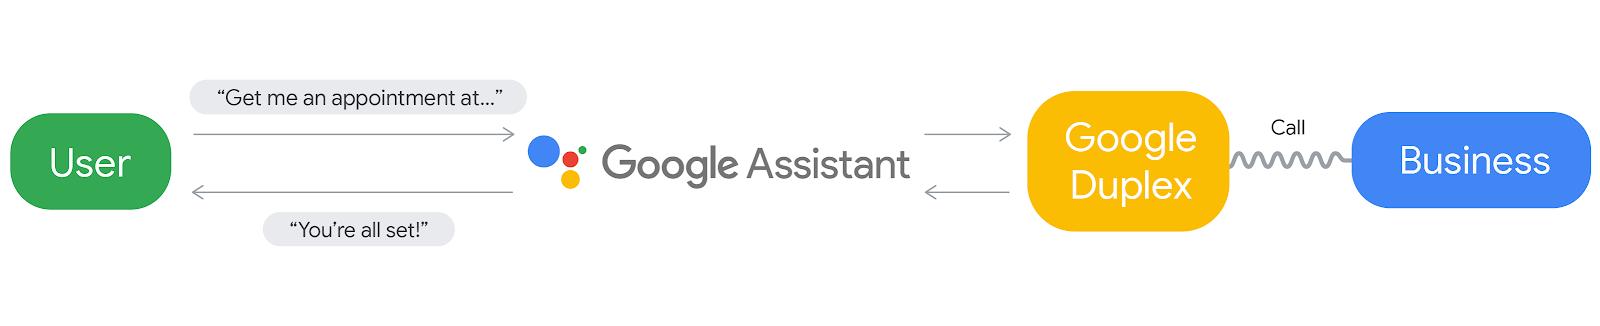 Talking to Google Duplex: Google's human-like phone AI feels revolutionary